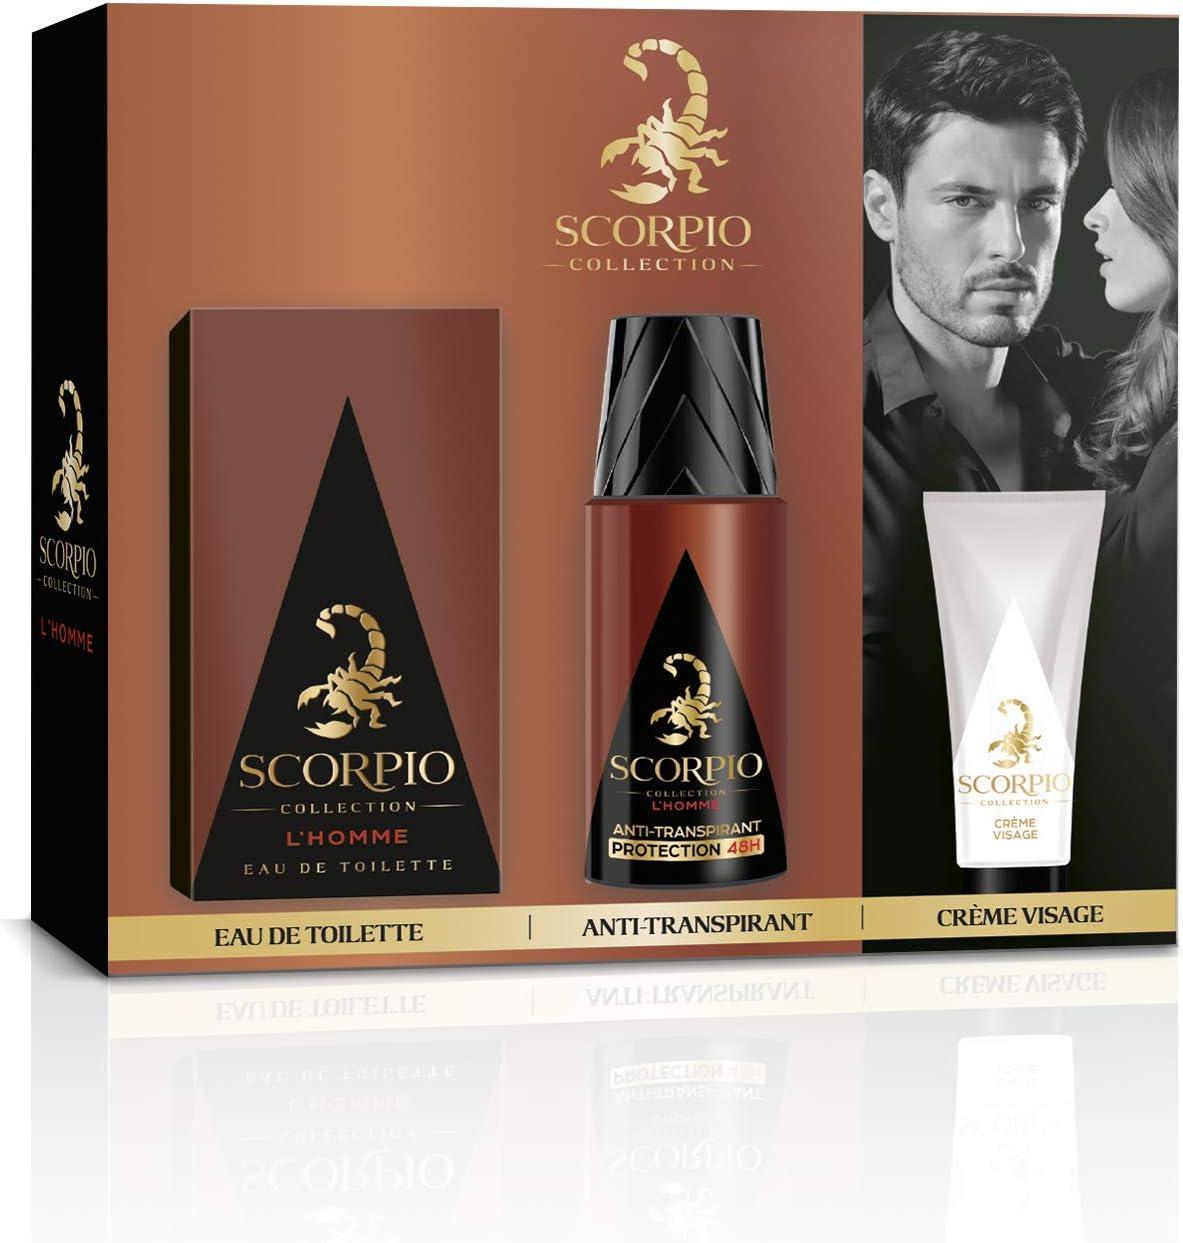 Scorpio Collection